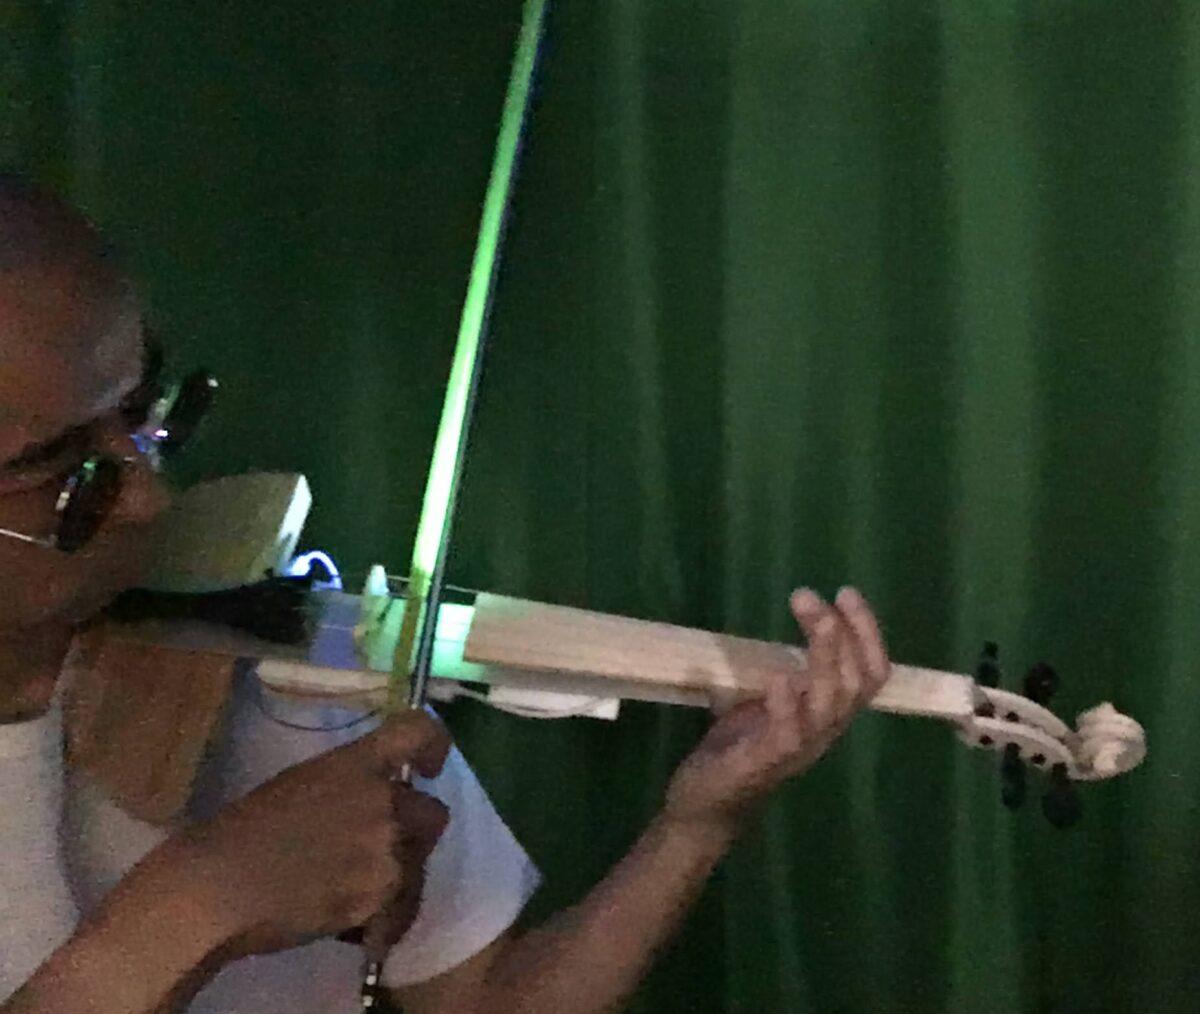 Spresense e-Violin V2